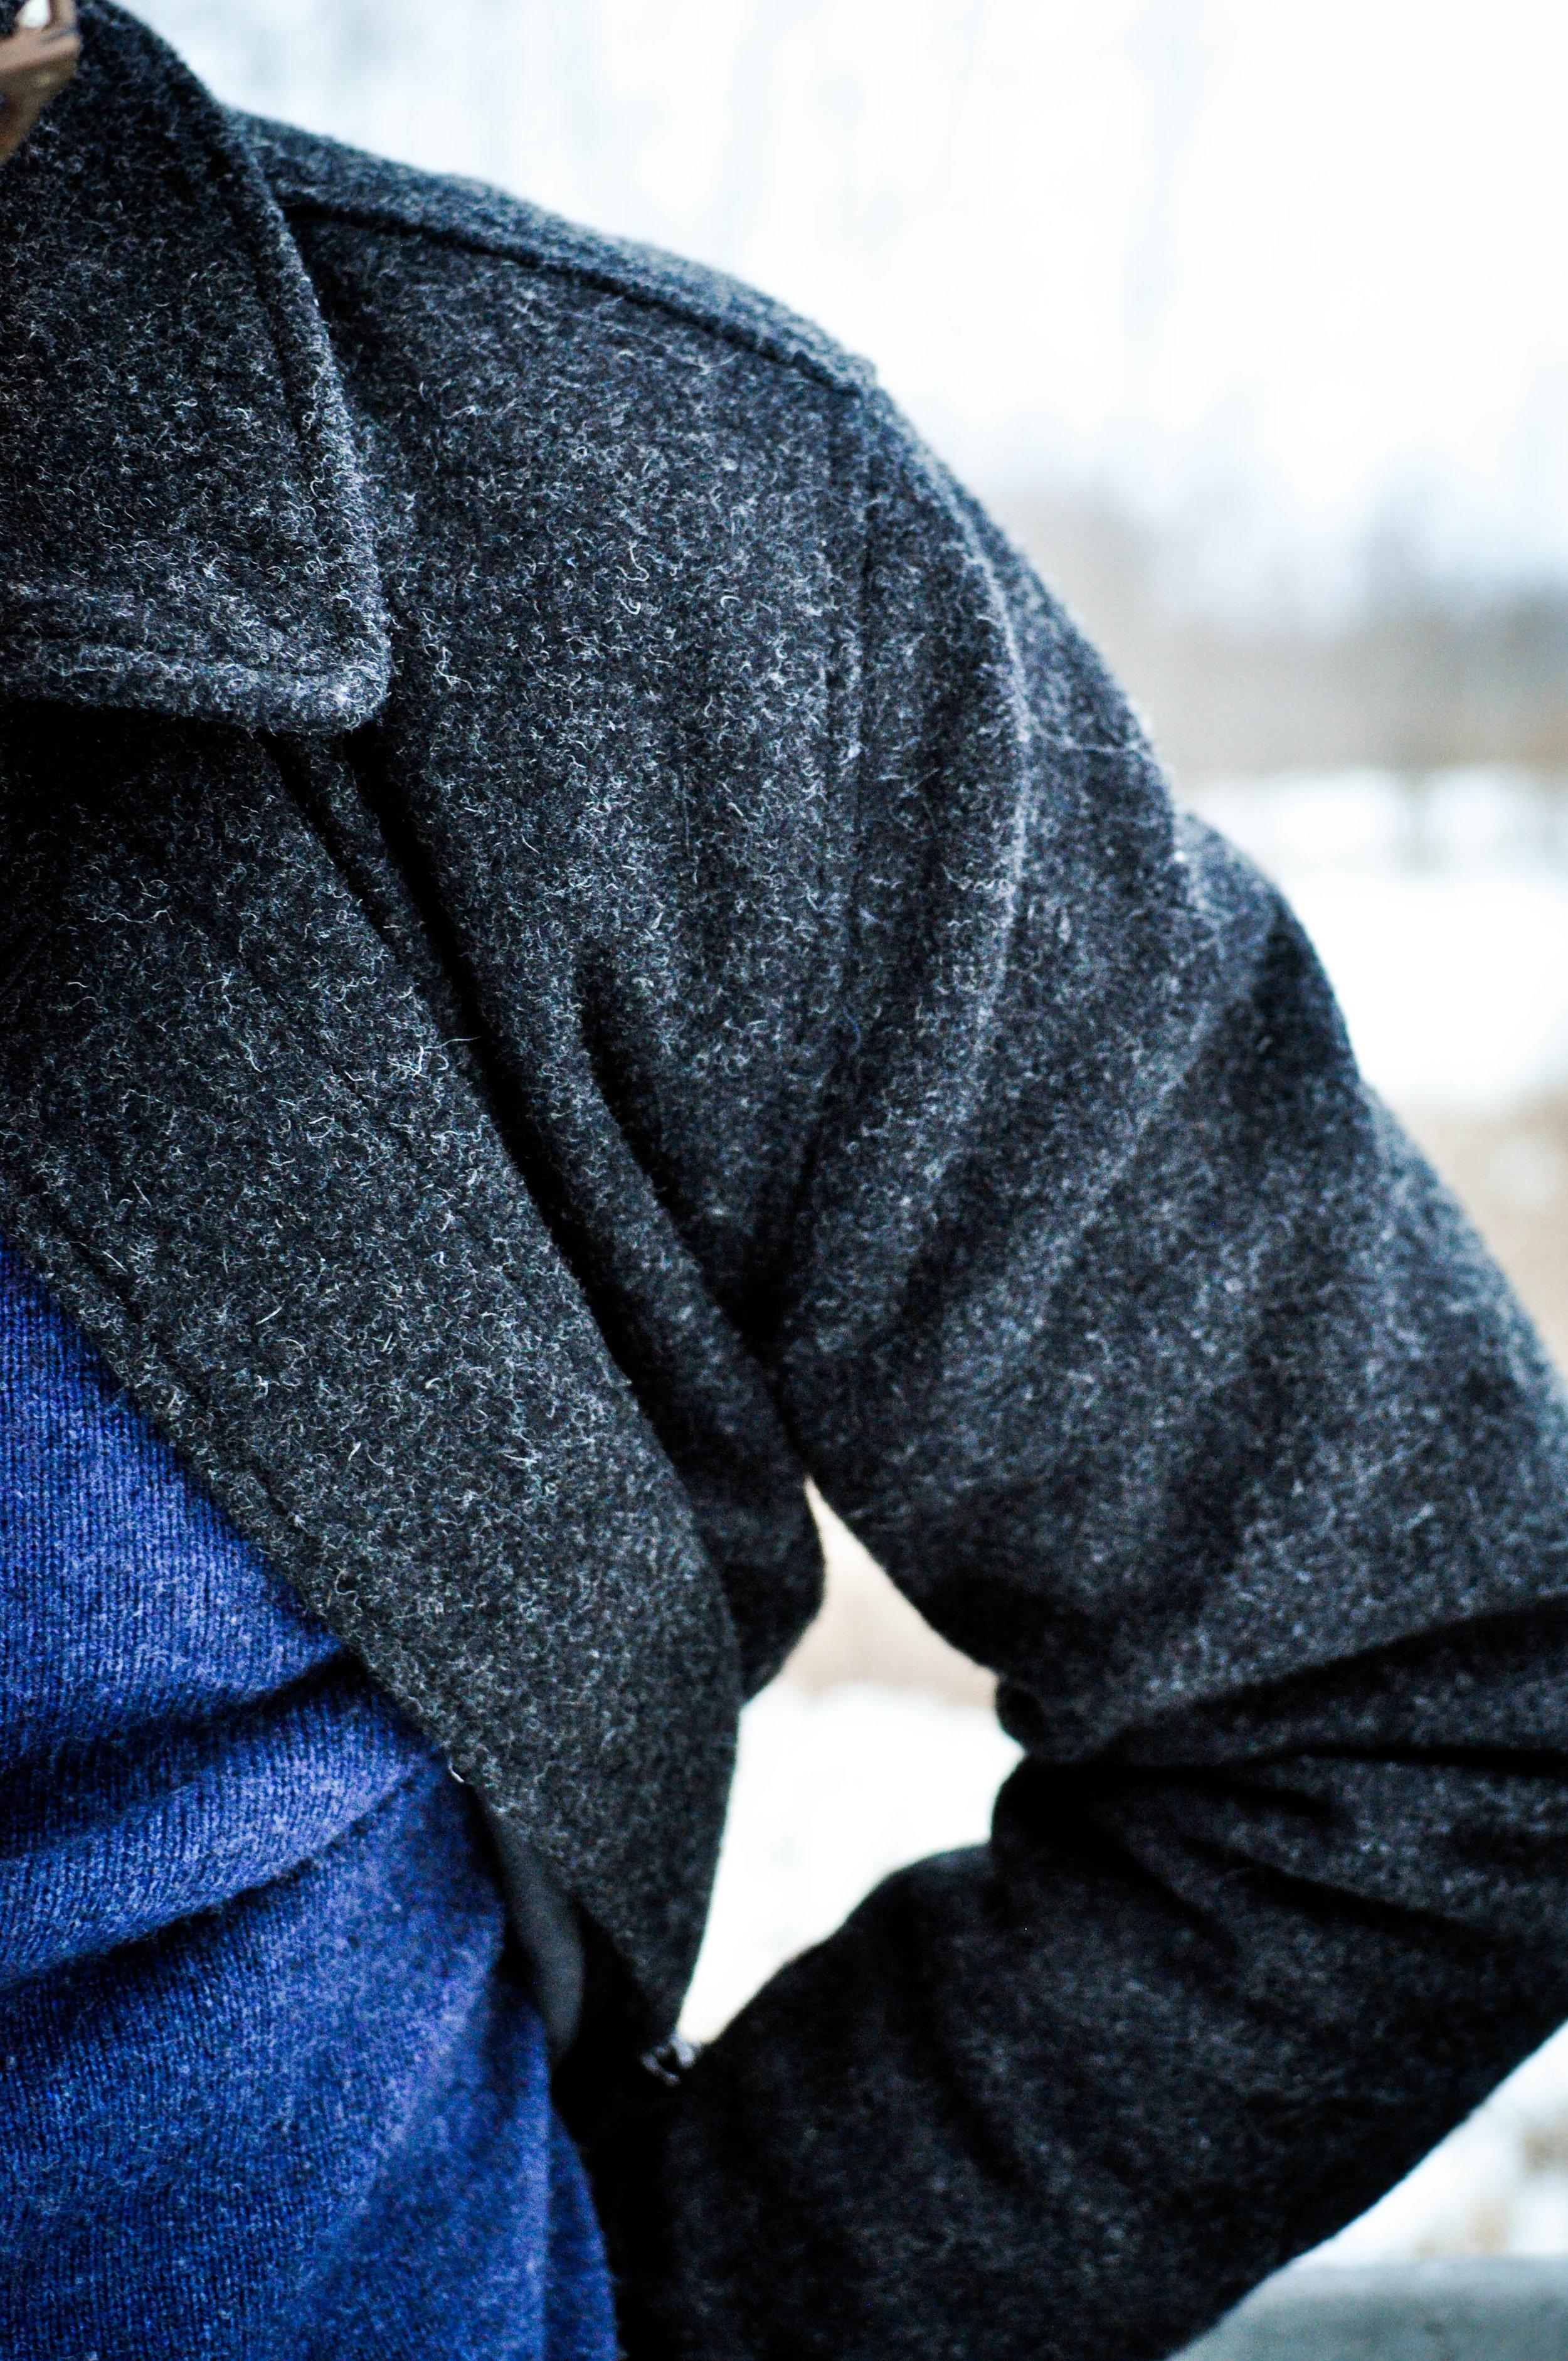 Up close shot of man's gray wool coat